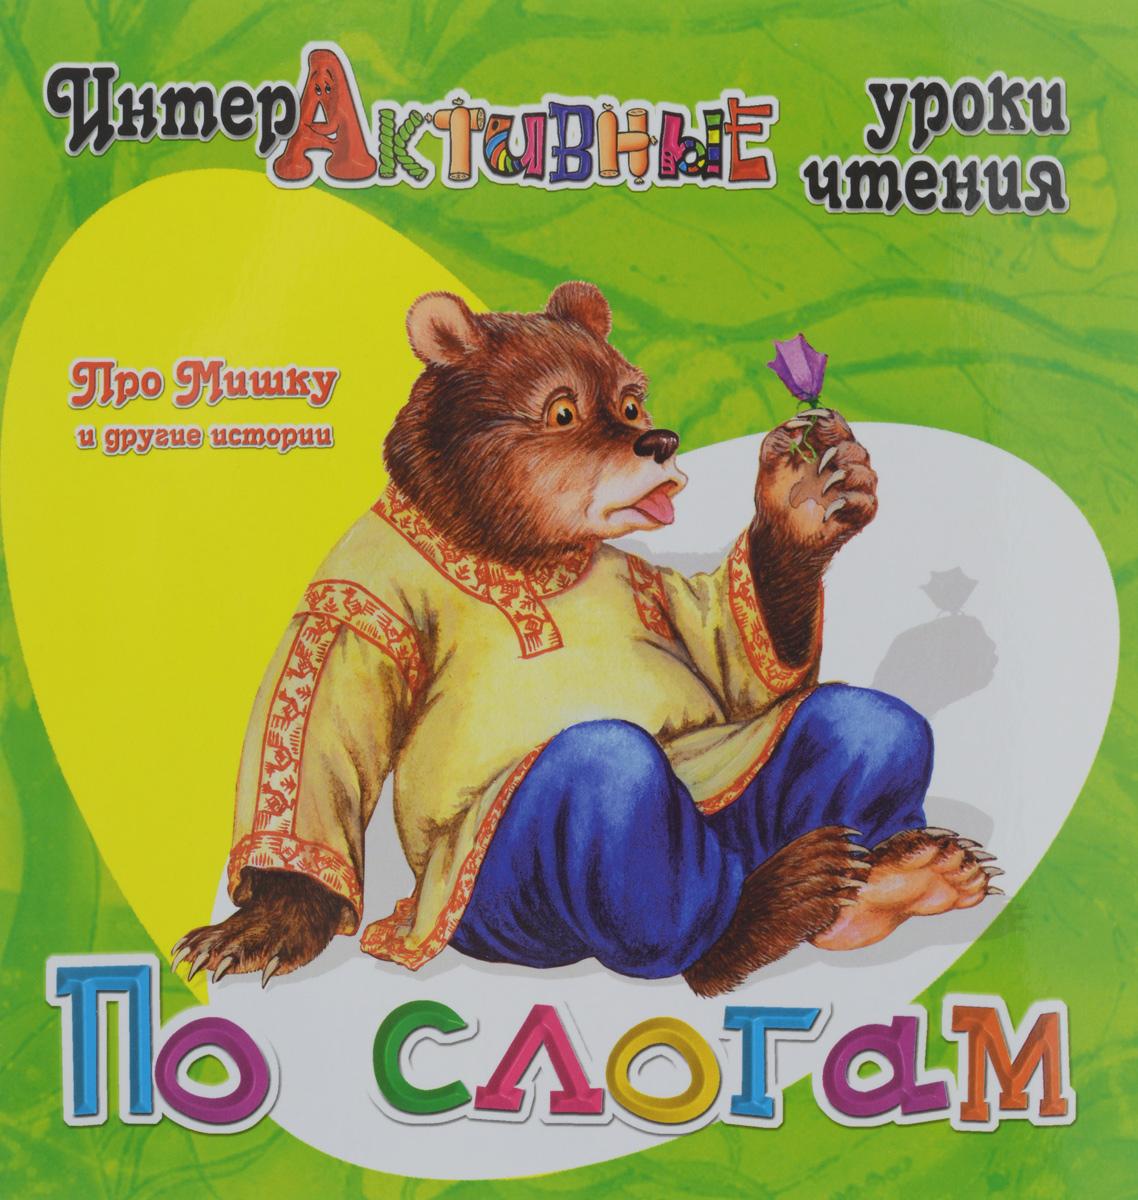 Про Мишку и другие истории